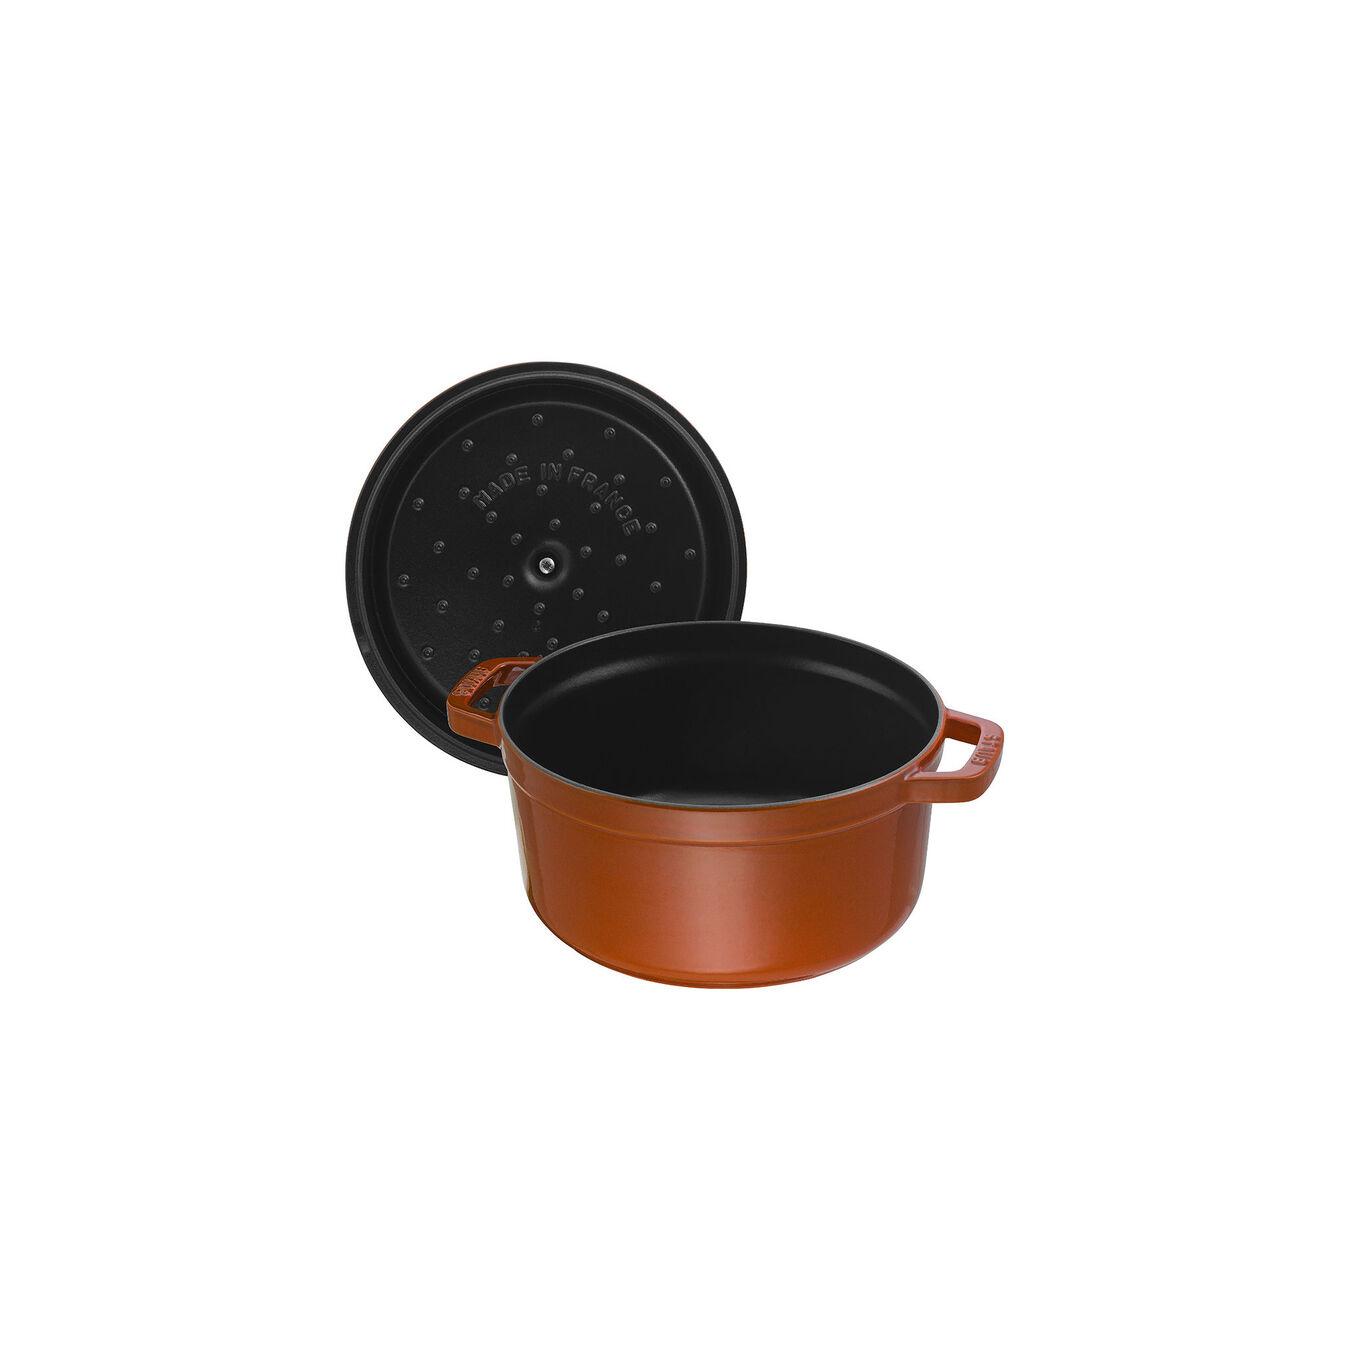 2.75-qt Round Cocotte - Burnt Orange,,large 4